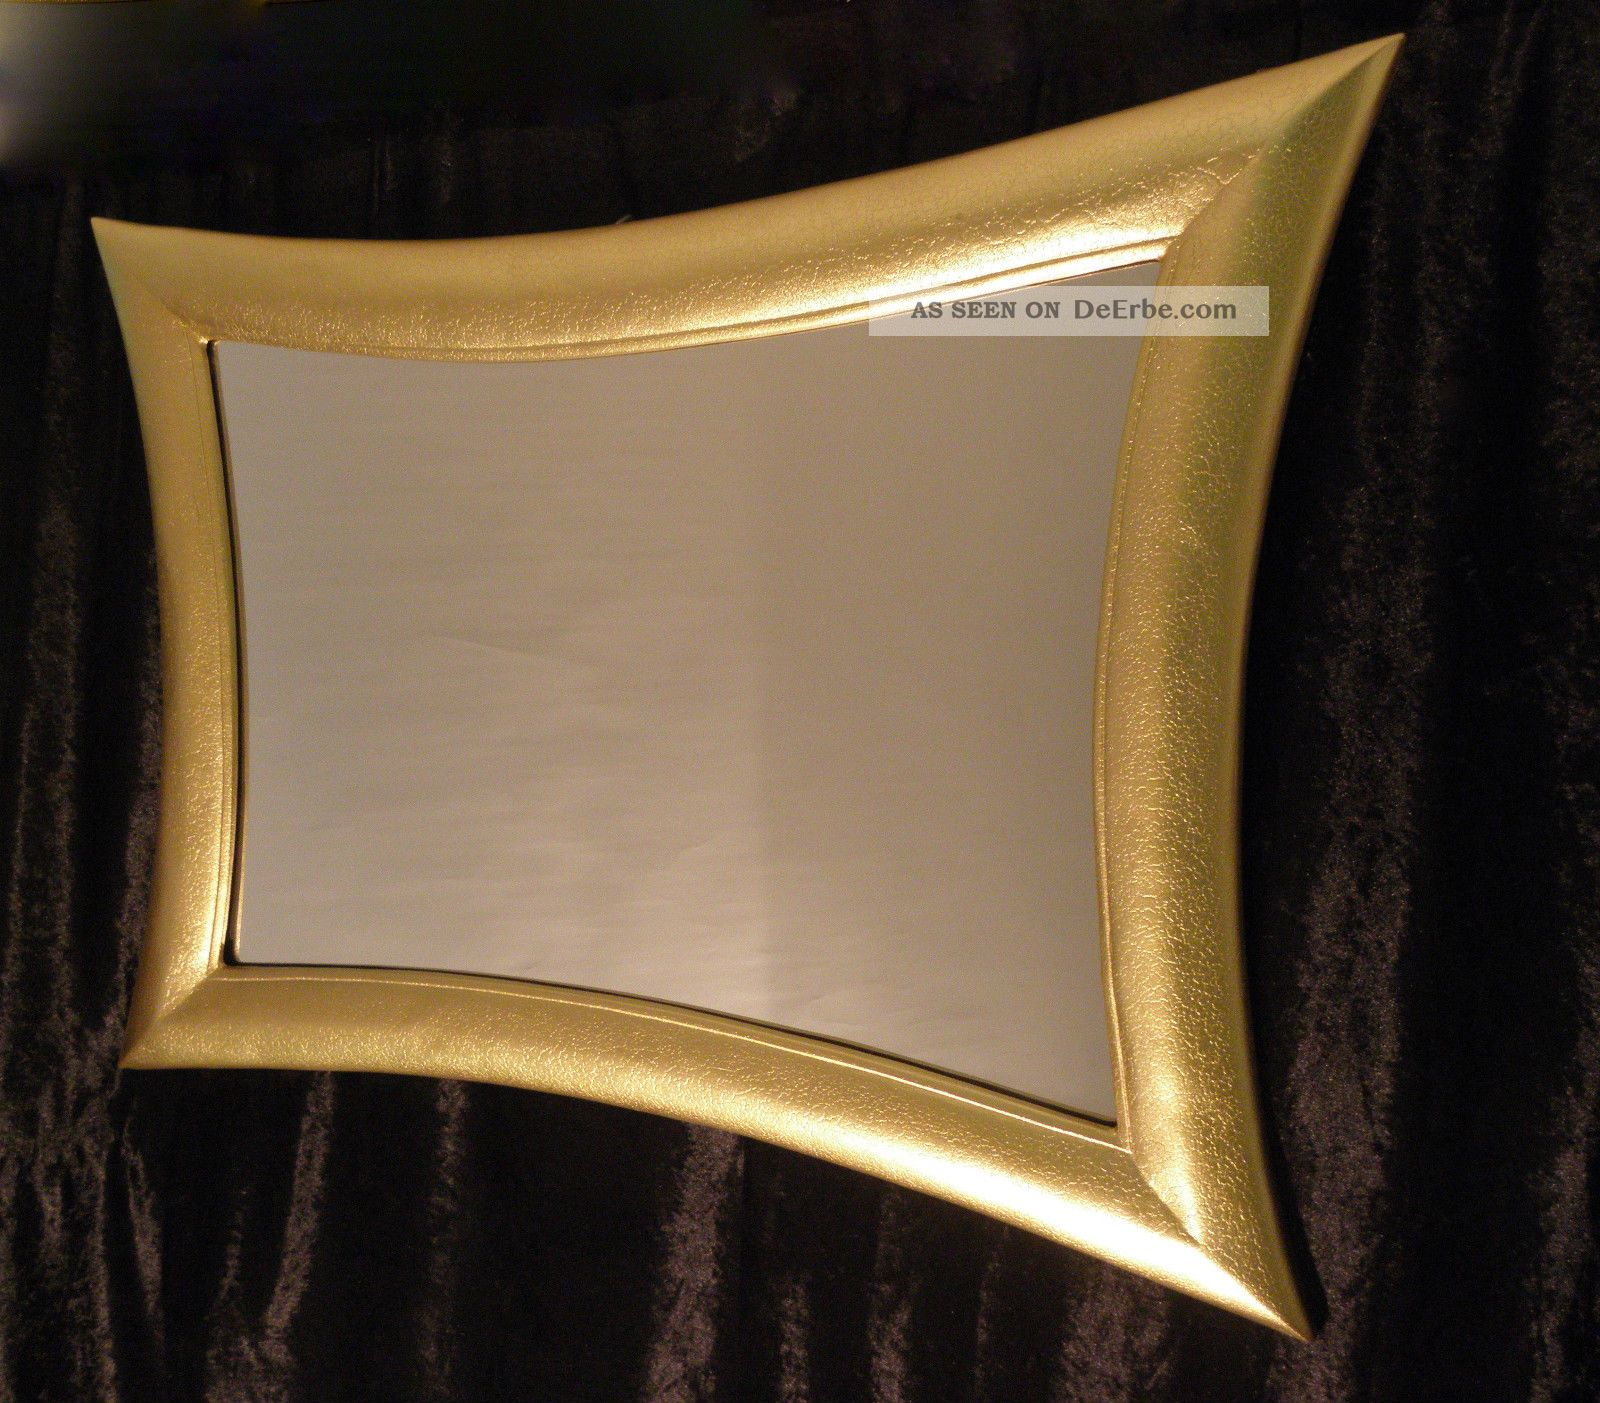 wandspiegel spiegel antikspiegel silber115cm x85cm holzrahmen modern retro. Black Bedroom Furniture Sets. Home Design Ideas